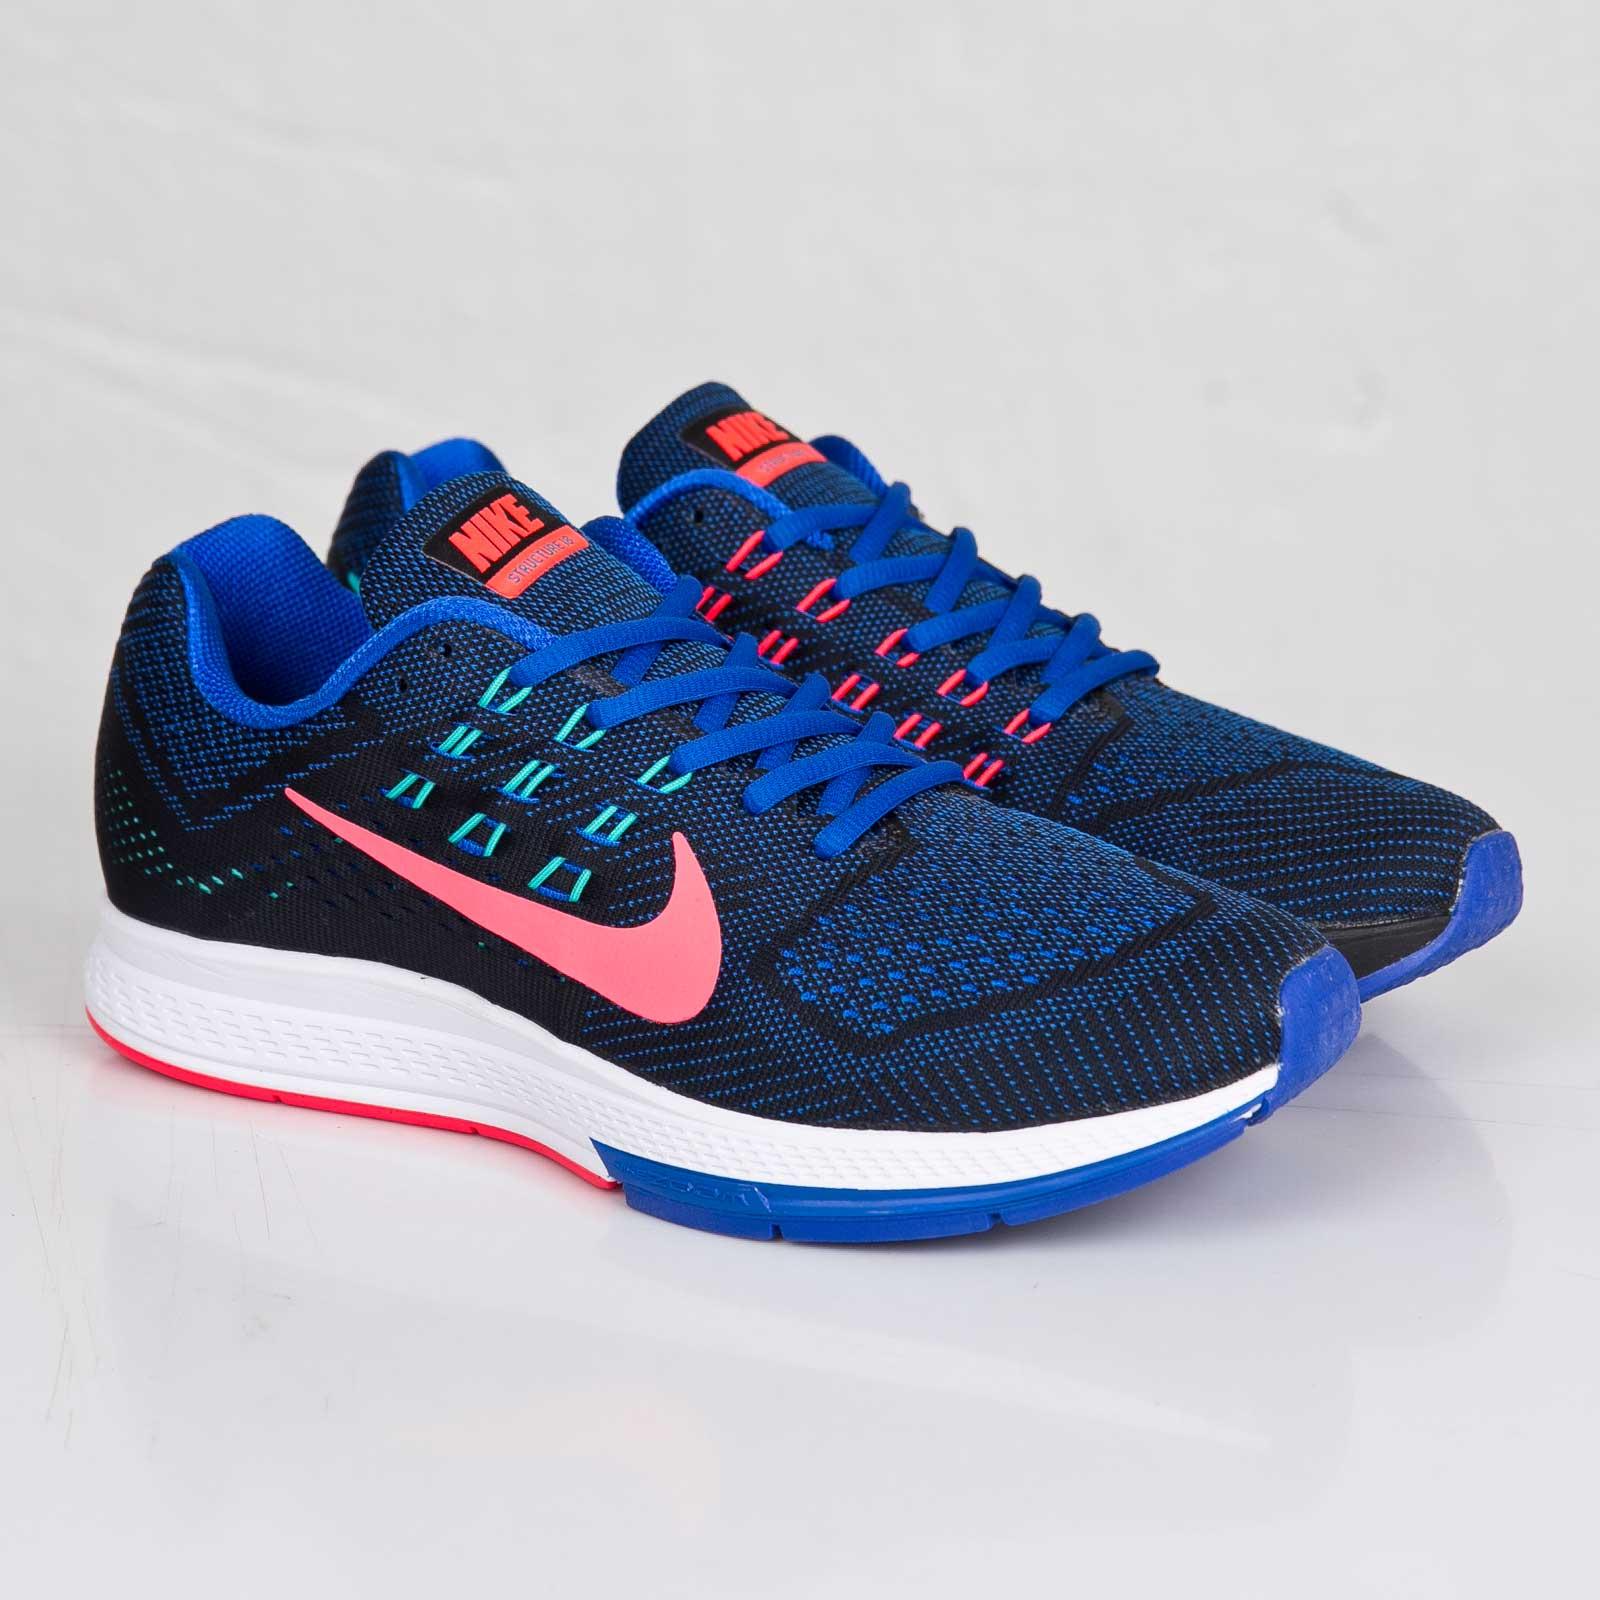 sale retailer 6ee1a bda63 Nike Air Zoom Structure 18 - 683731-400 - Sneakersnstuff ...